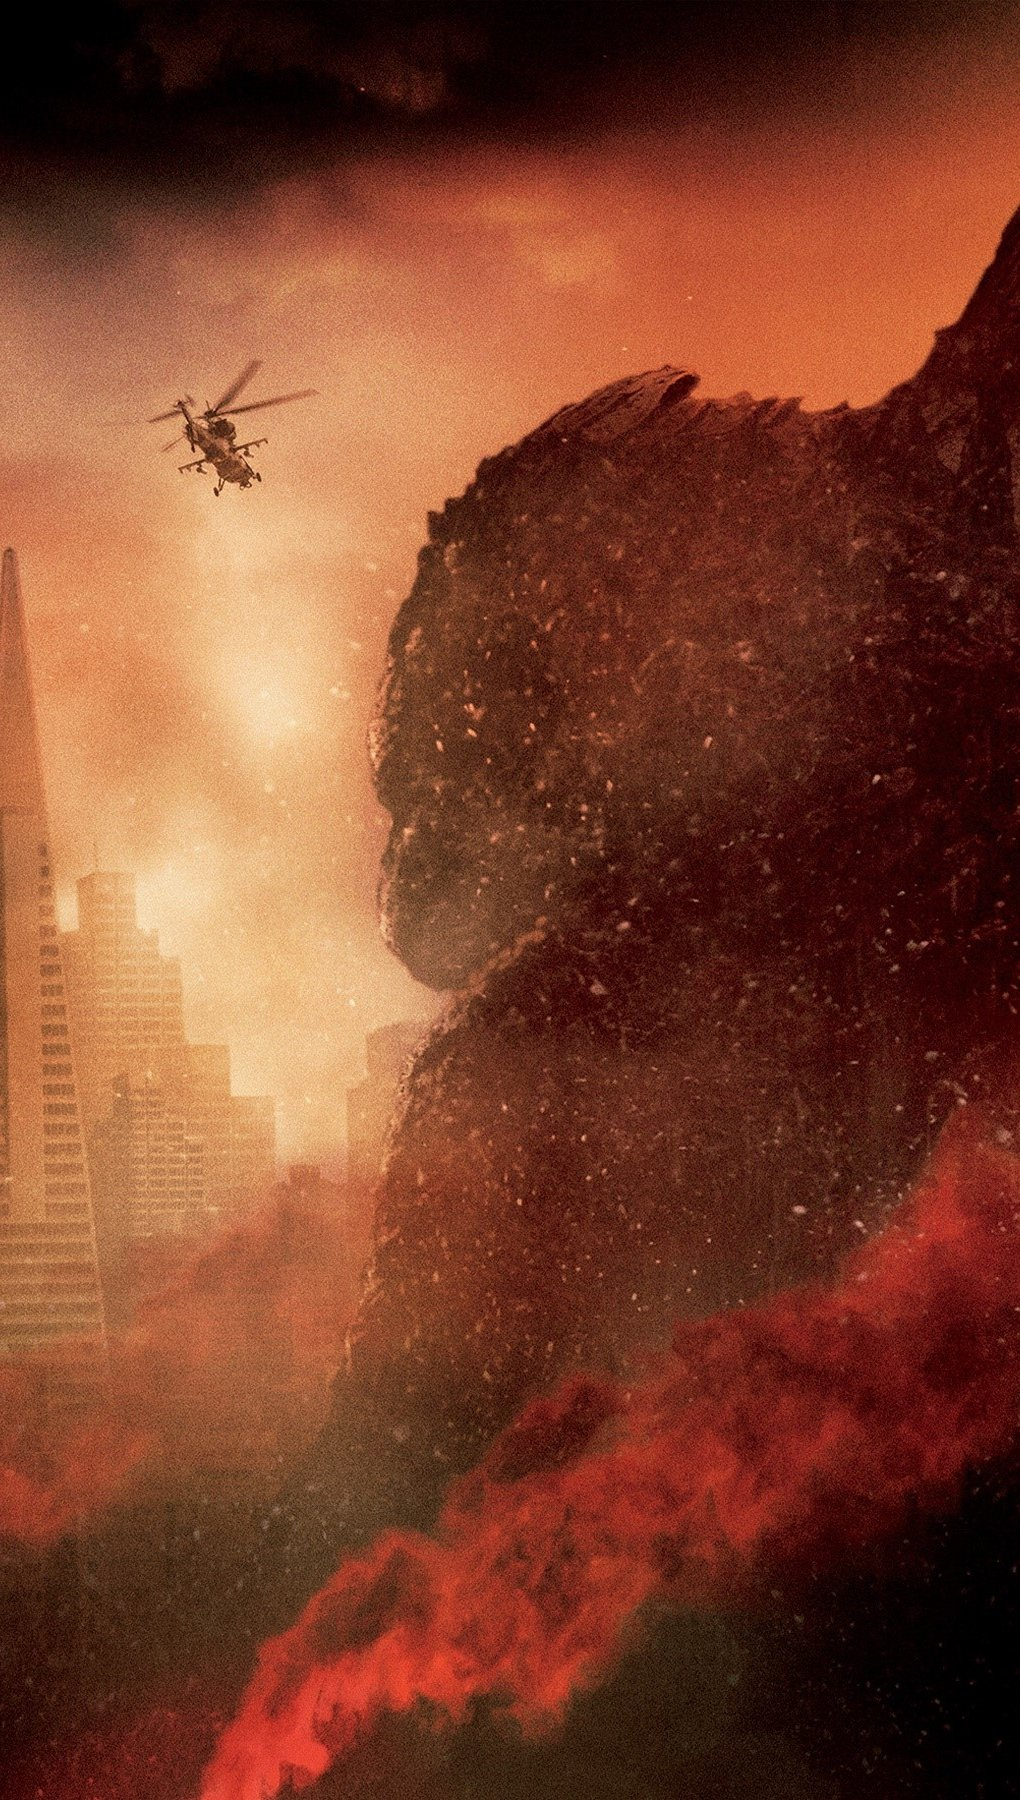 Wallpaper Godzilla Vertical